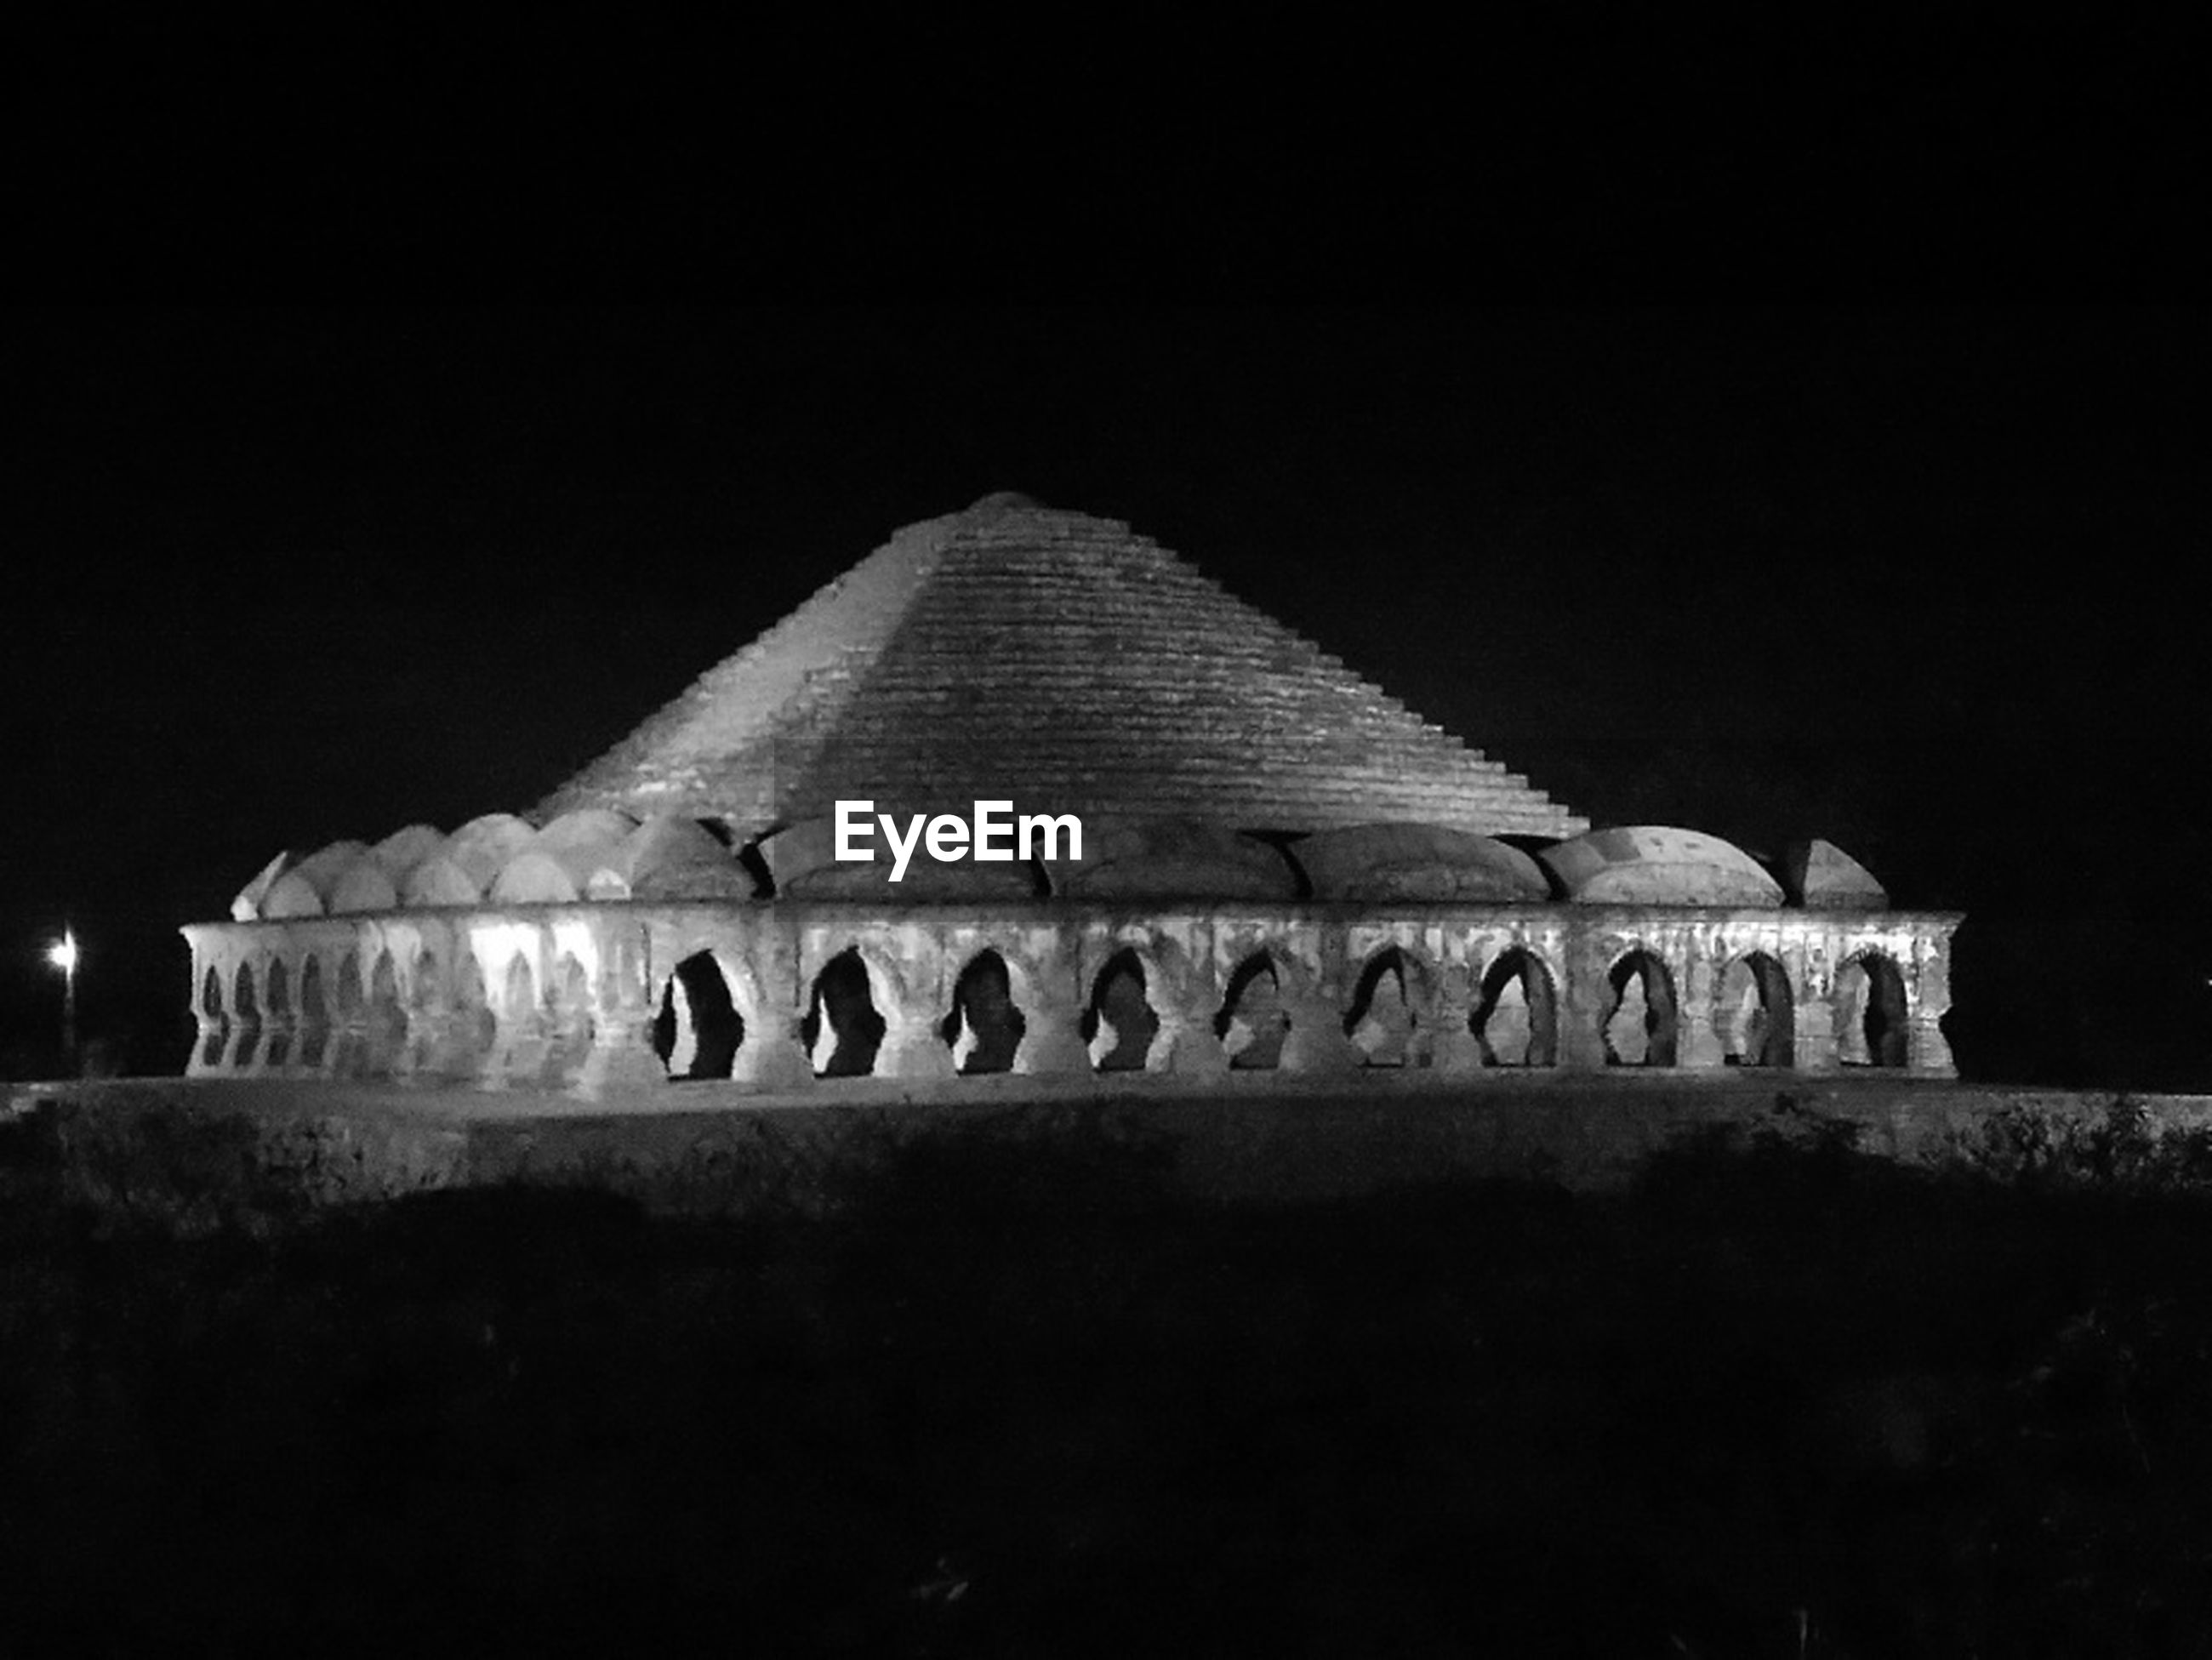 Rasmancha temple at night